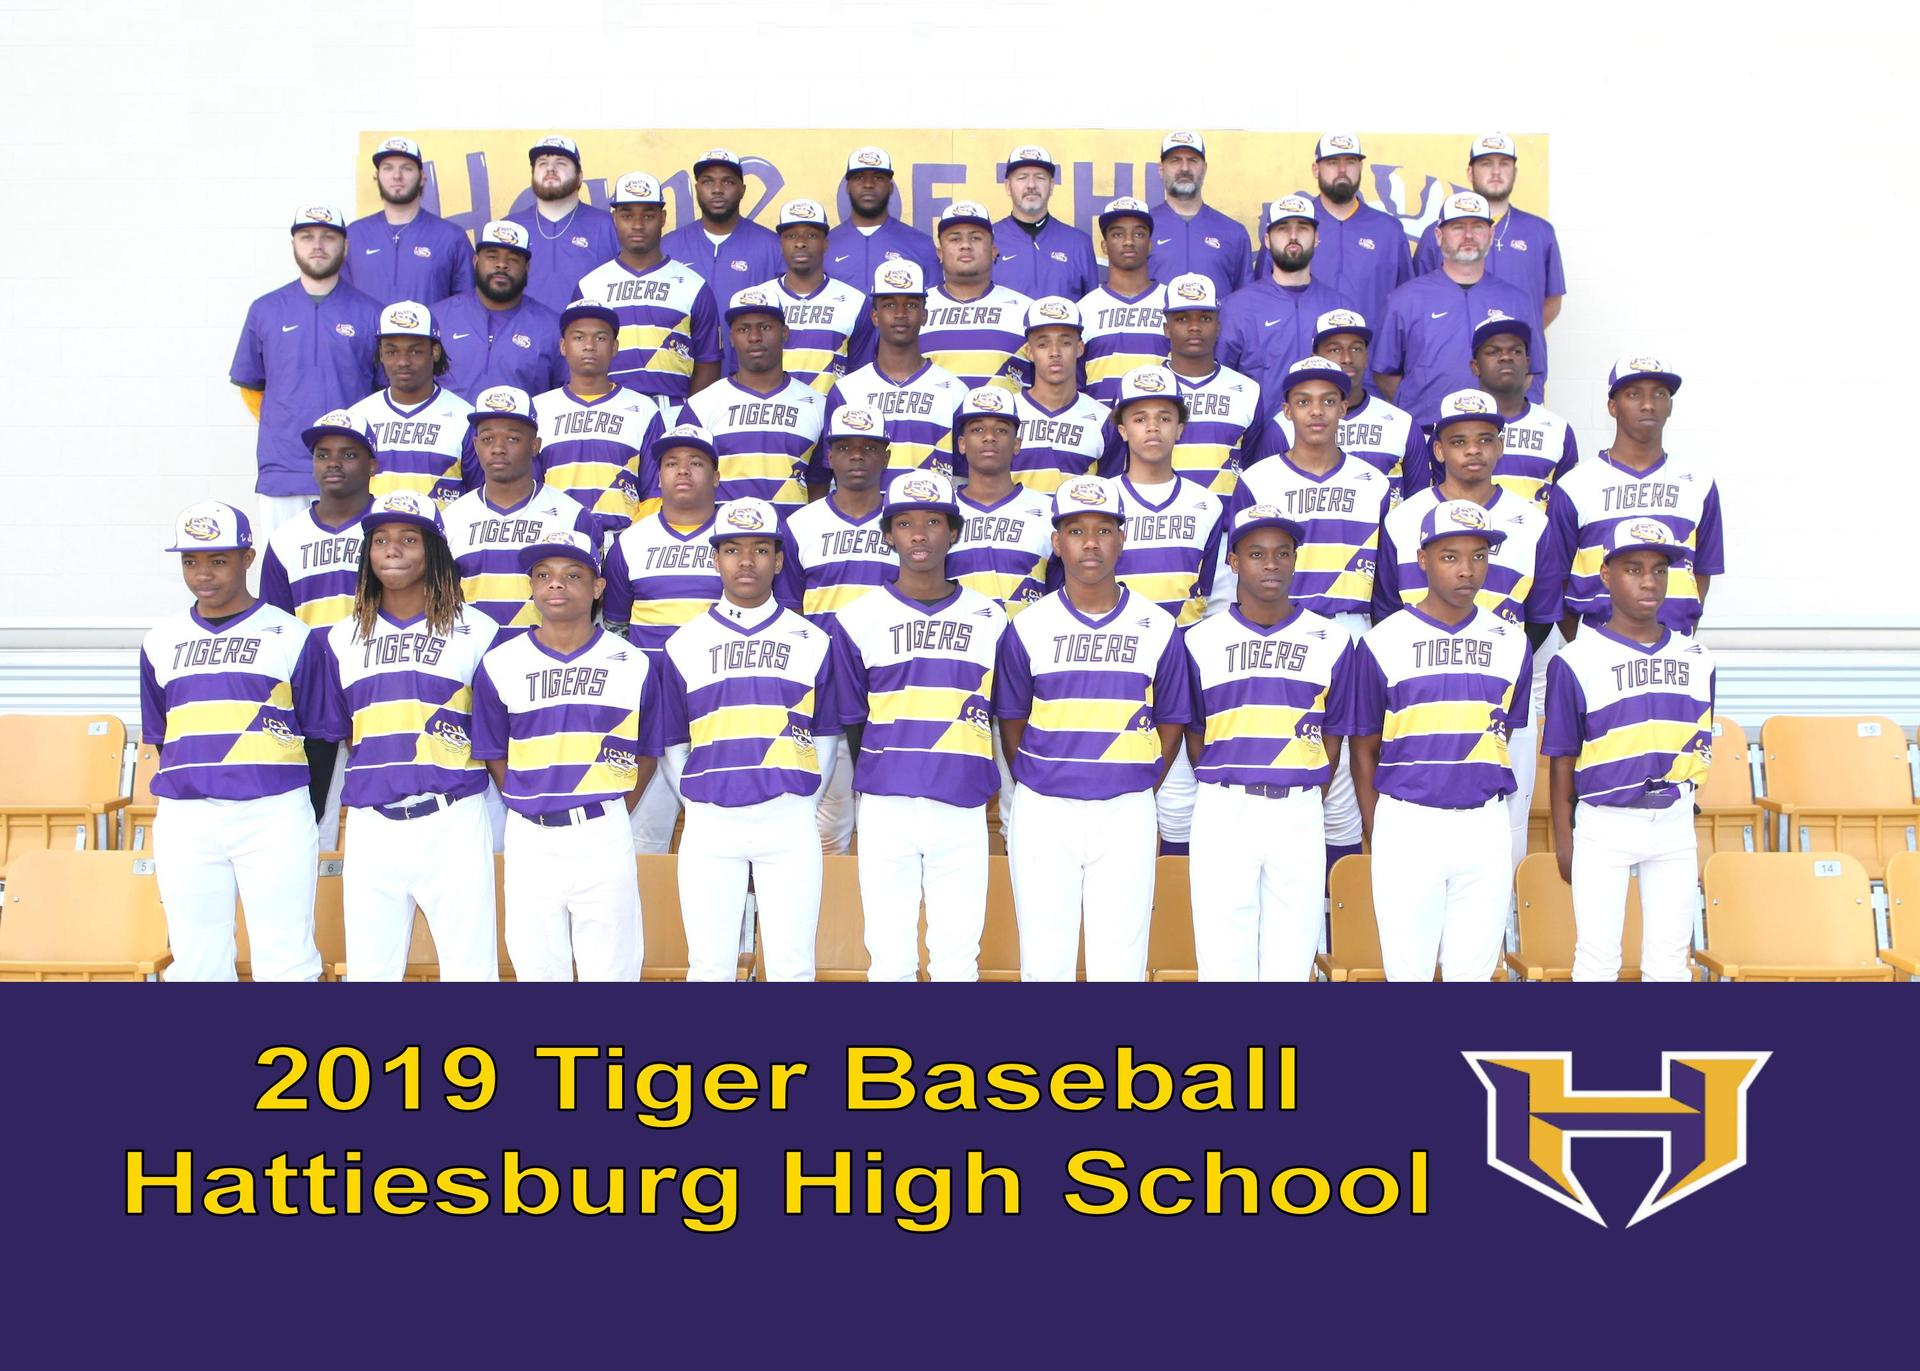 Hattiesburg High School Baseball Team